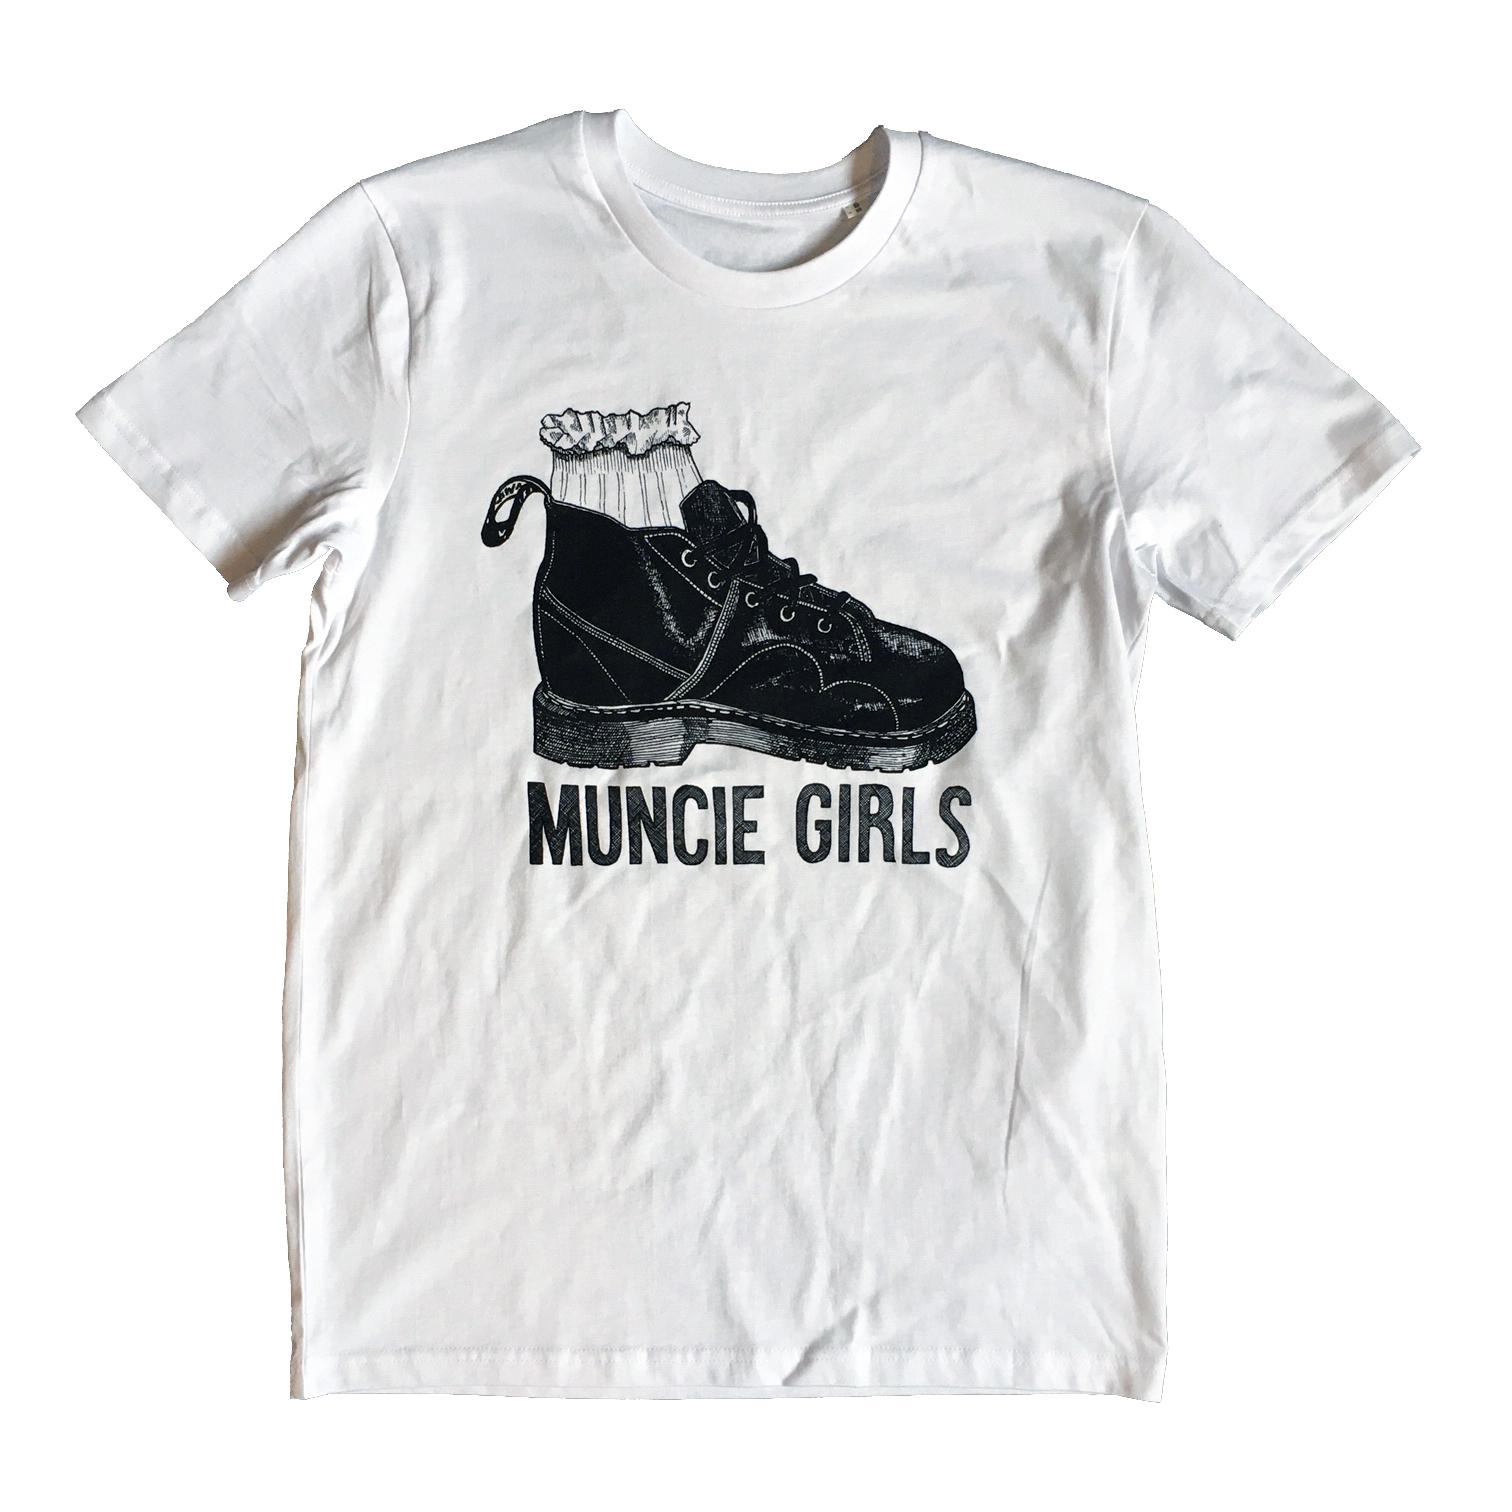 Muncie Girls 'Boot' Shirt